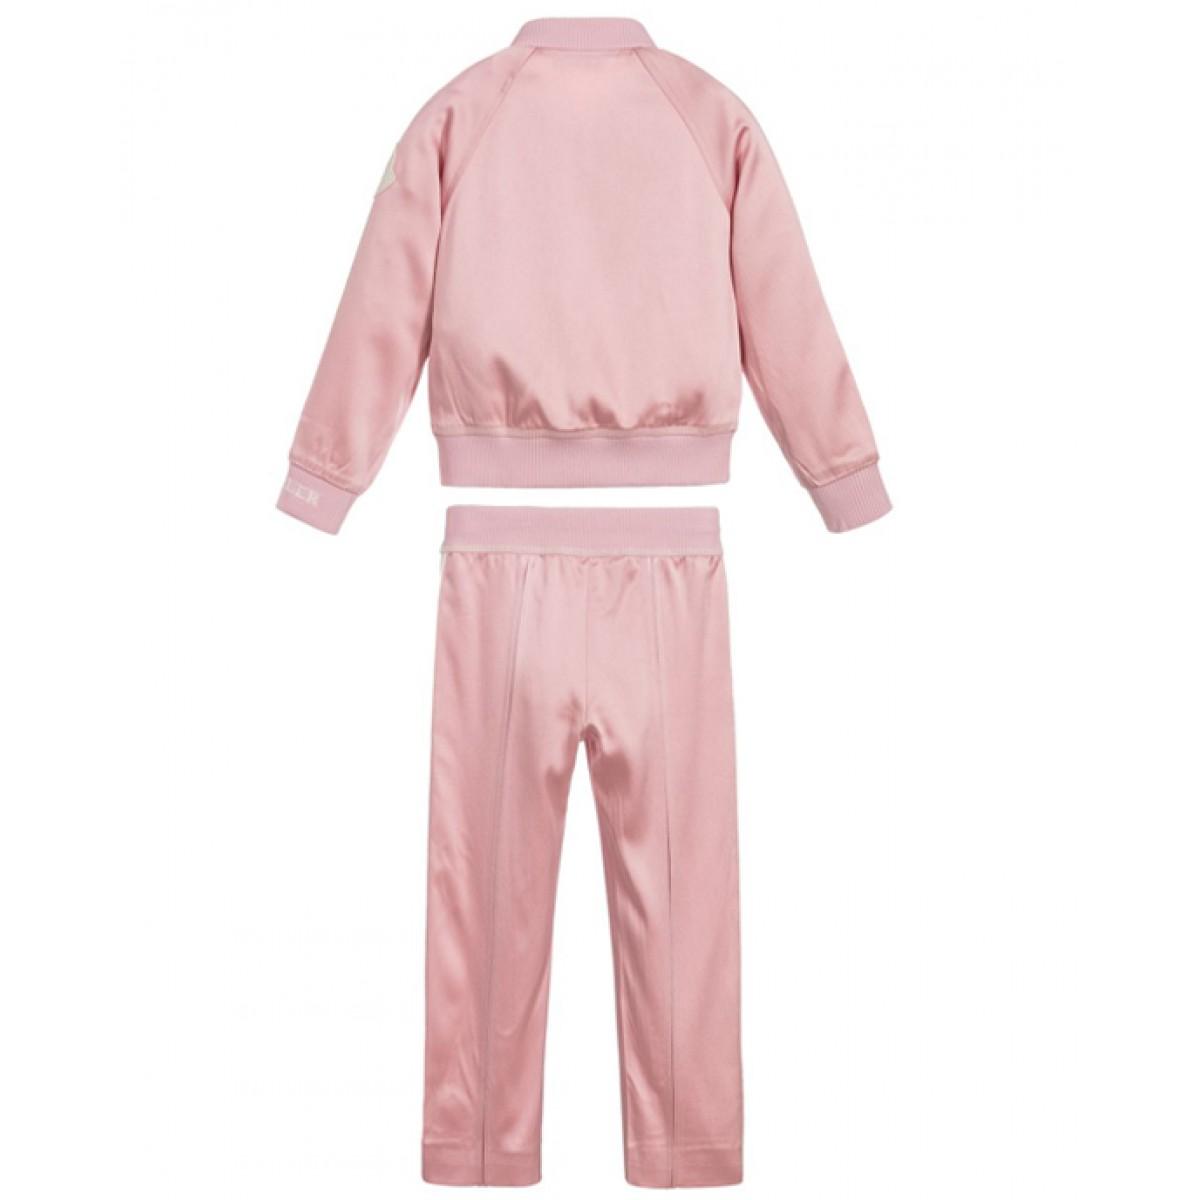 Pink satin tracksuit